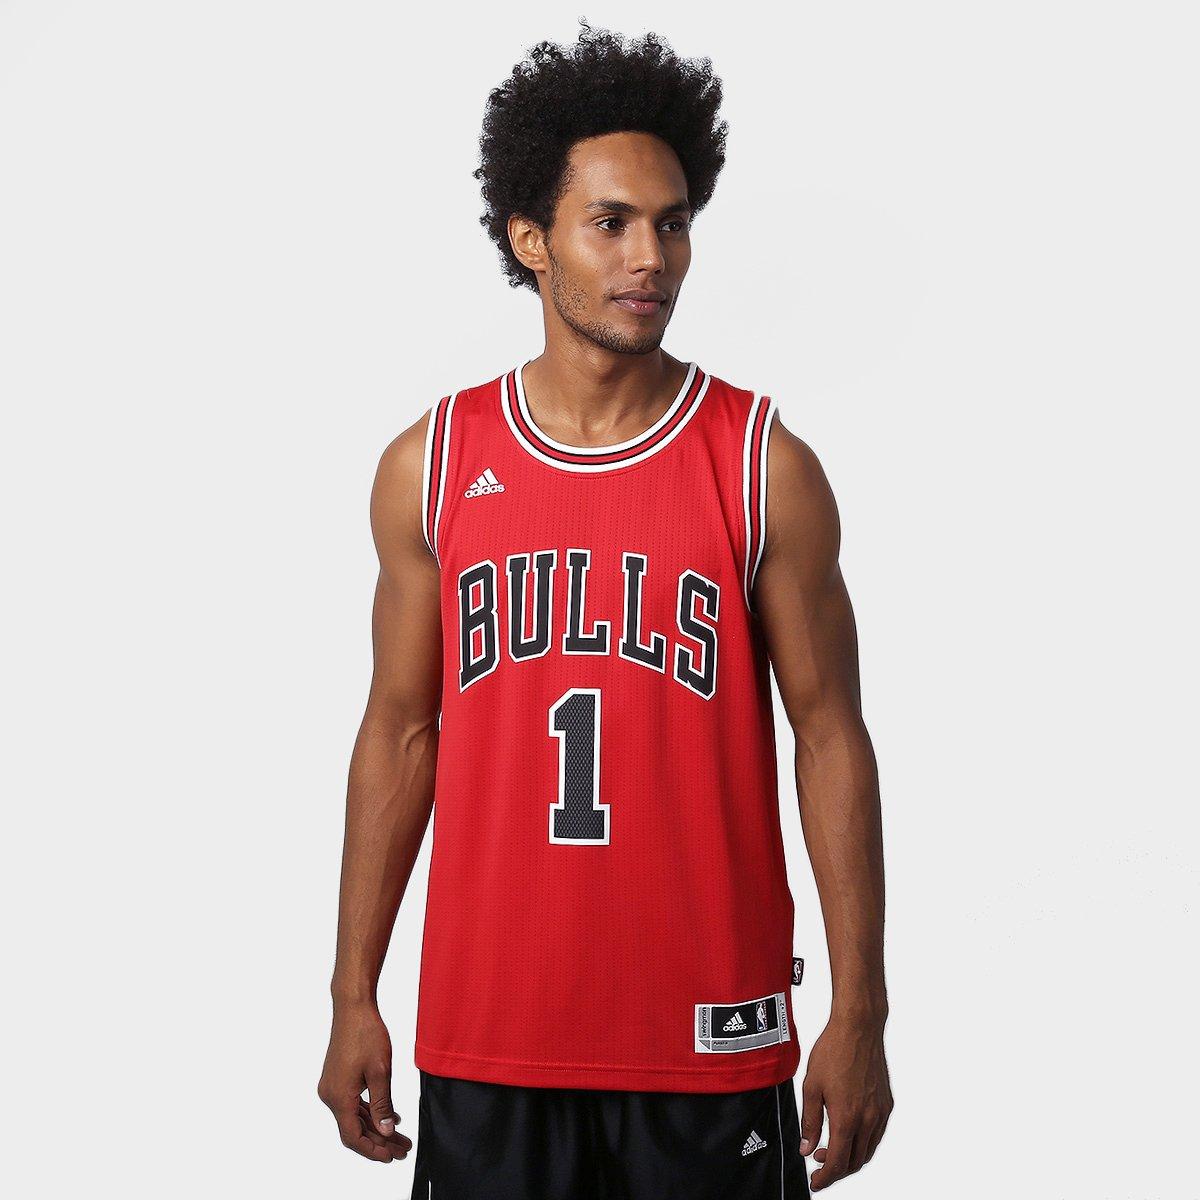 c99388b54614c Camiseta Regata NBA Adidas Swingman Chicago Bulls - Rose - Compre Agora